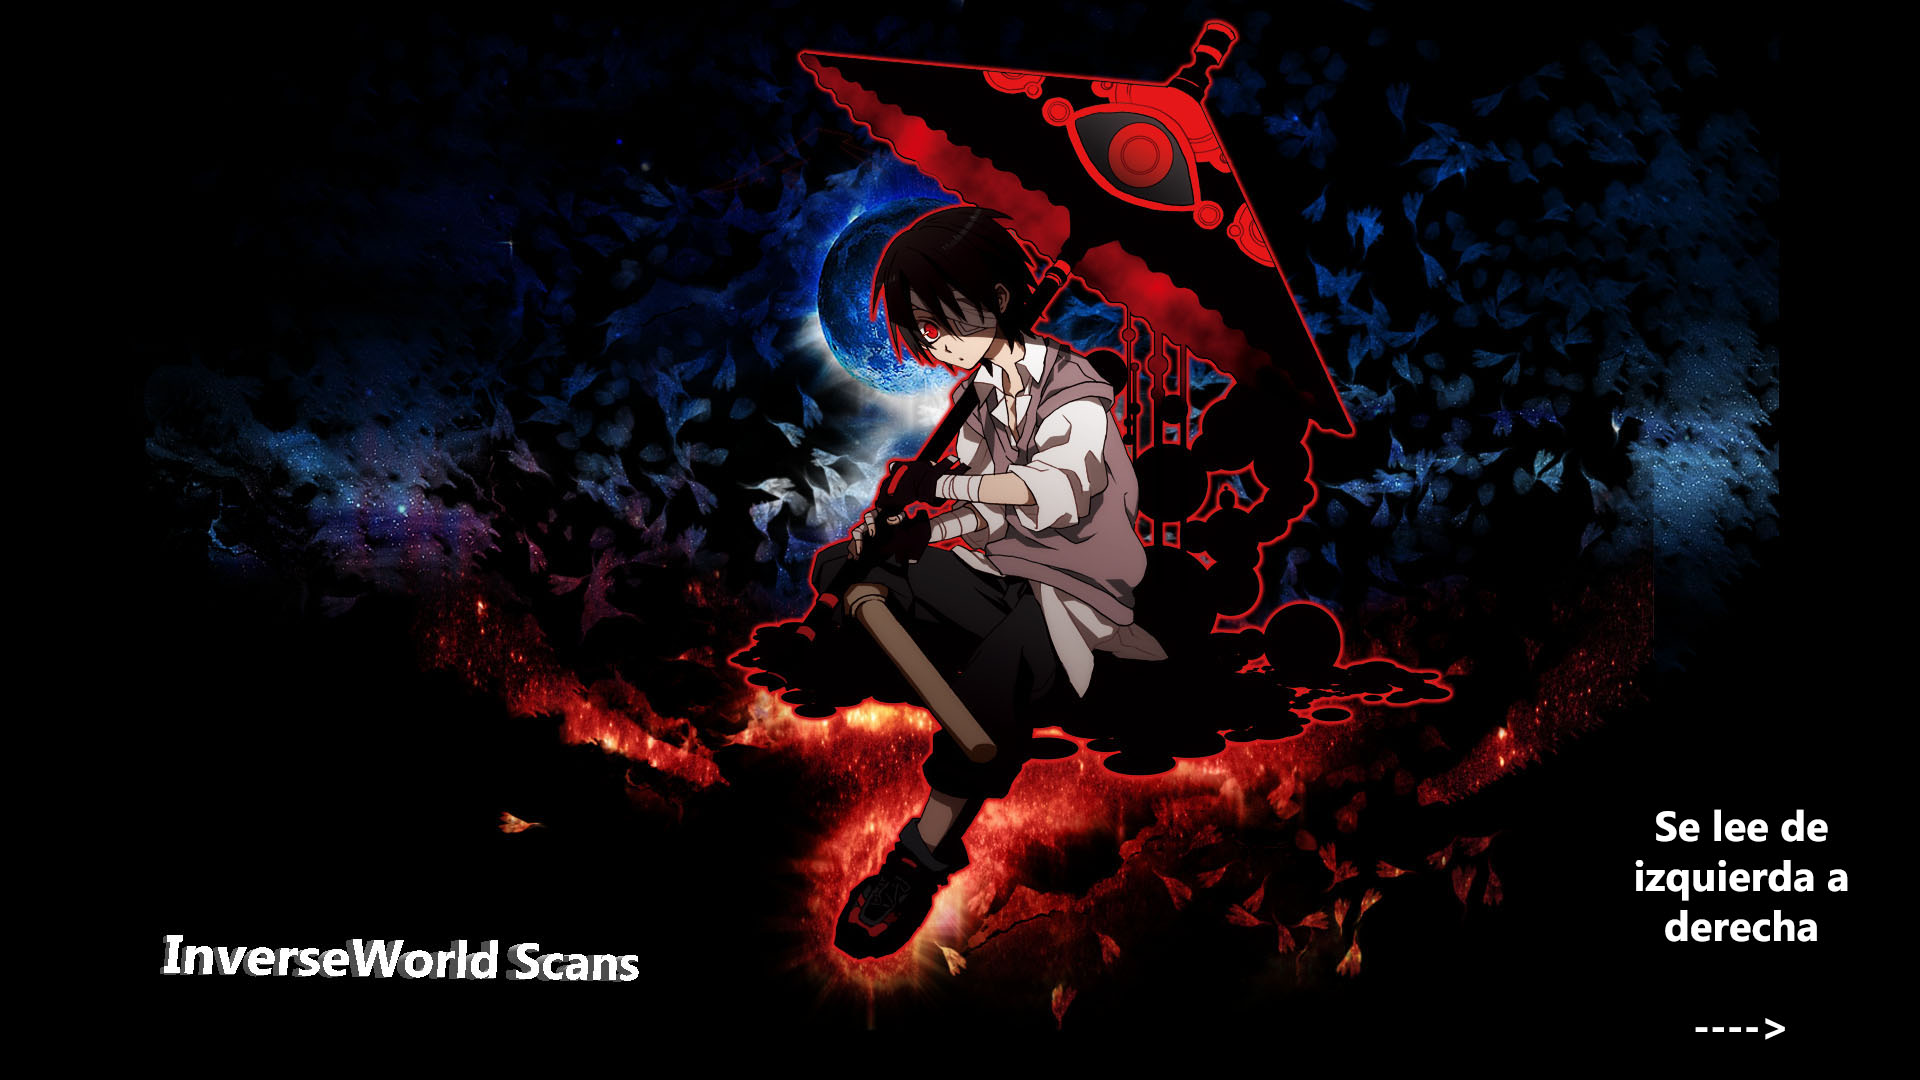 https://c5.mangatag.com/es_manga/18/16210/390087/69516965caa2e105770f453ad70d0254.jpg Page 1